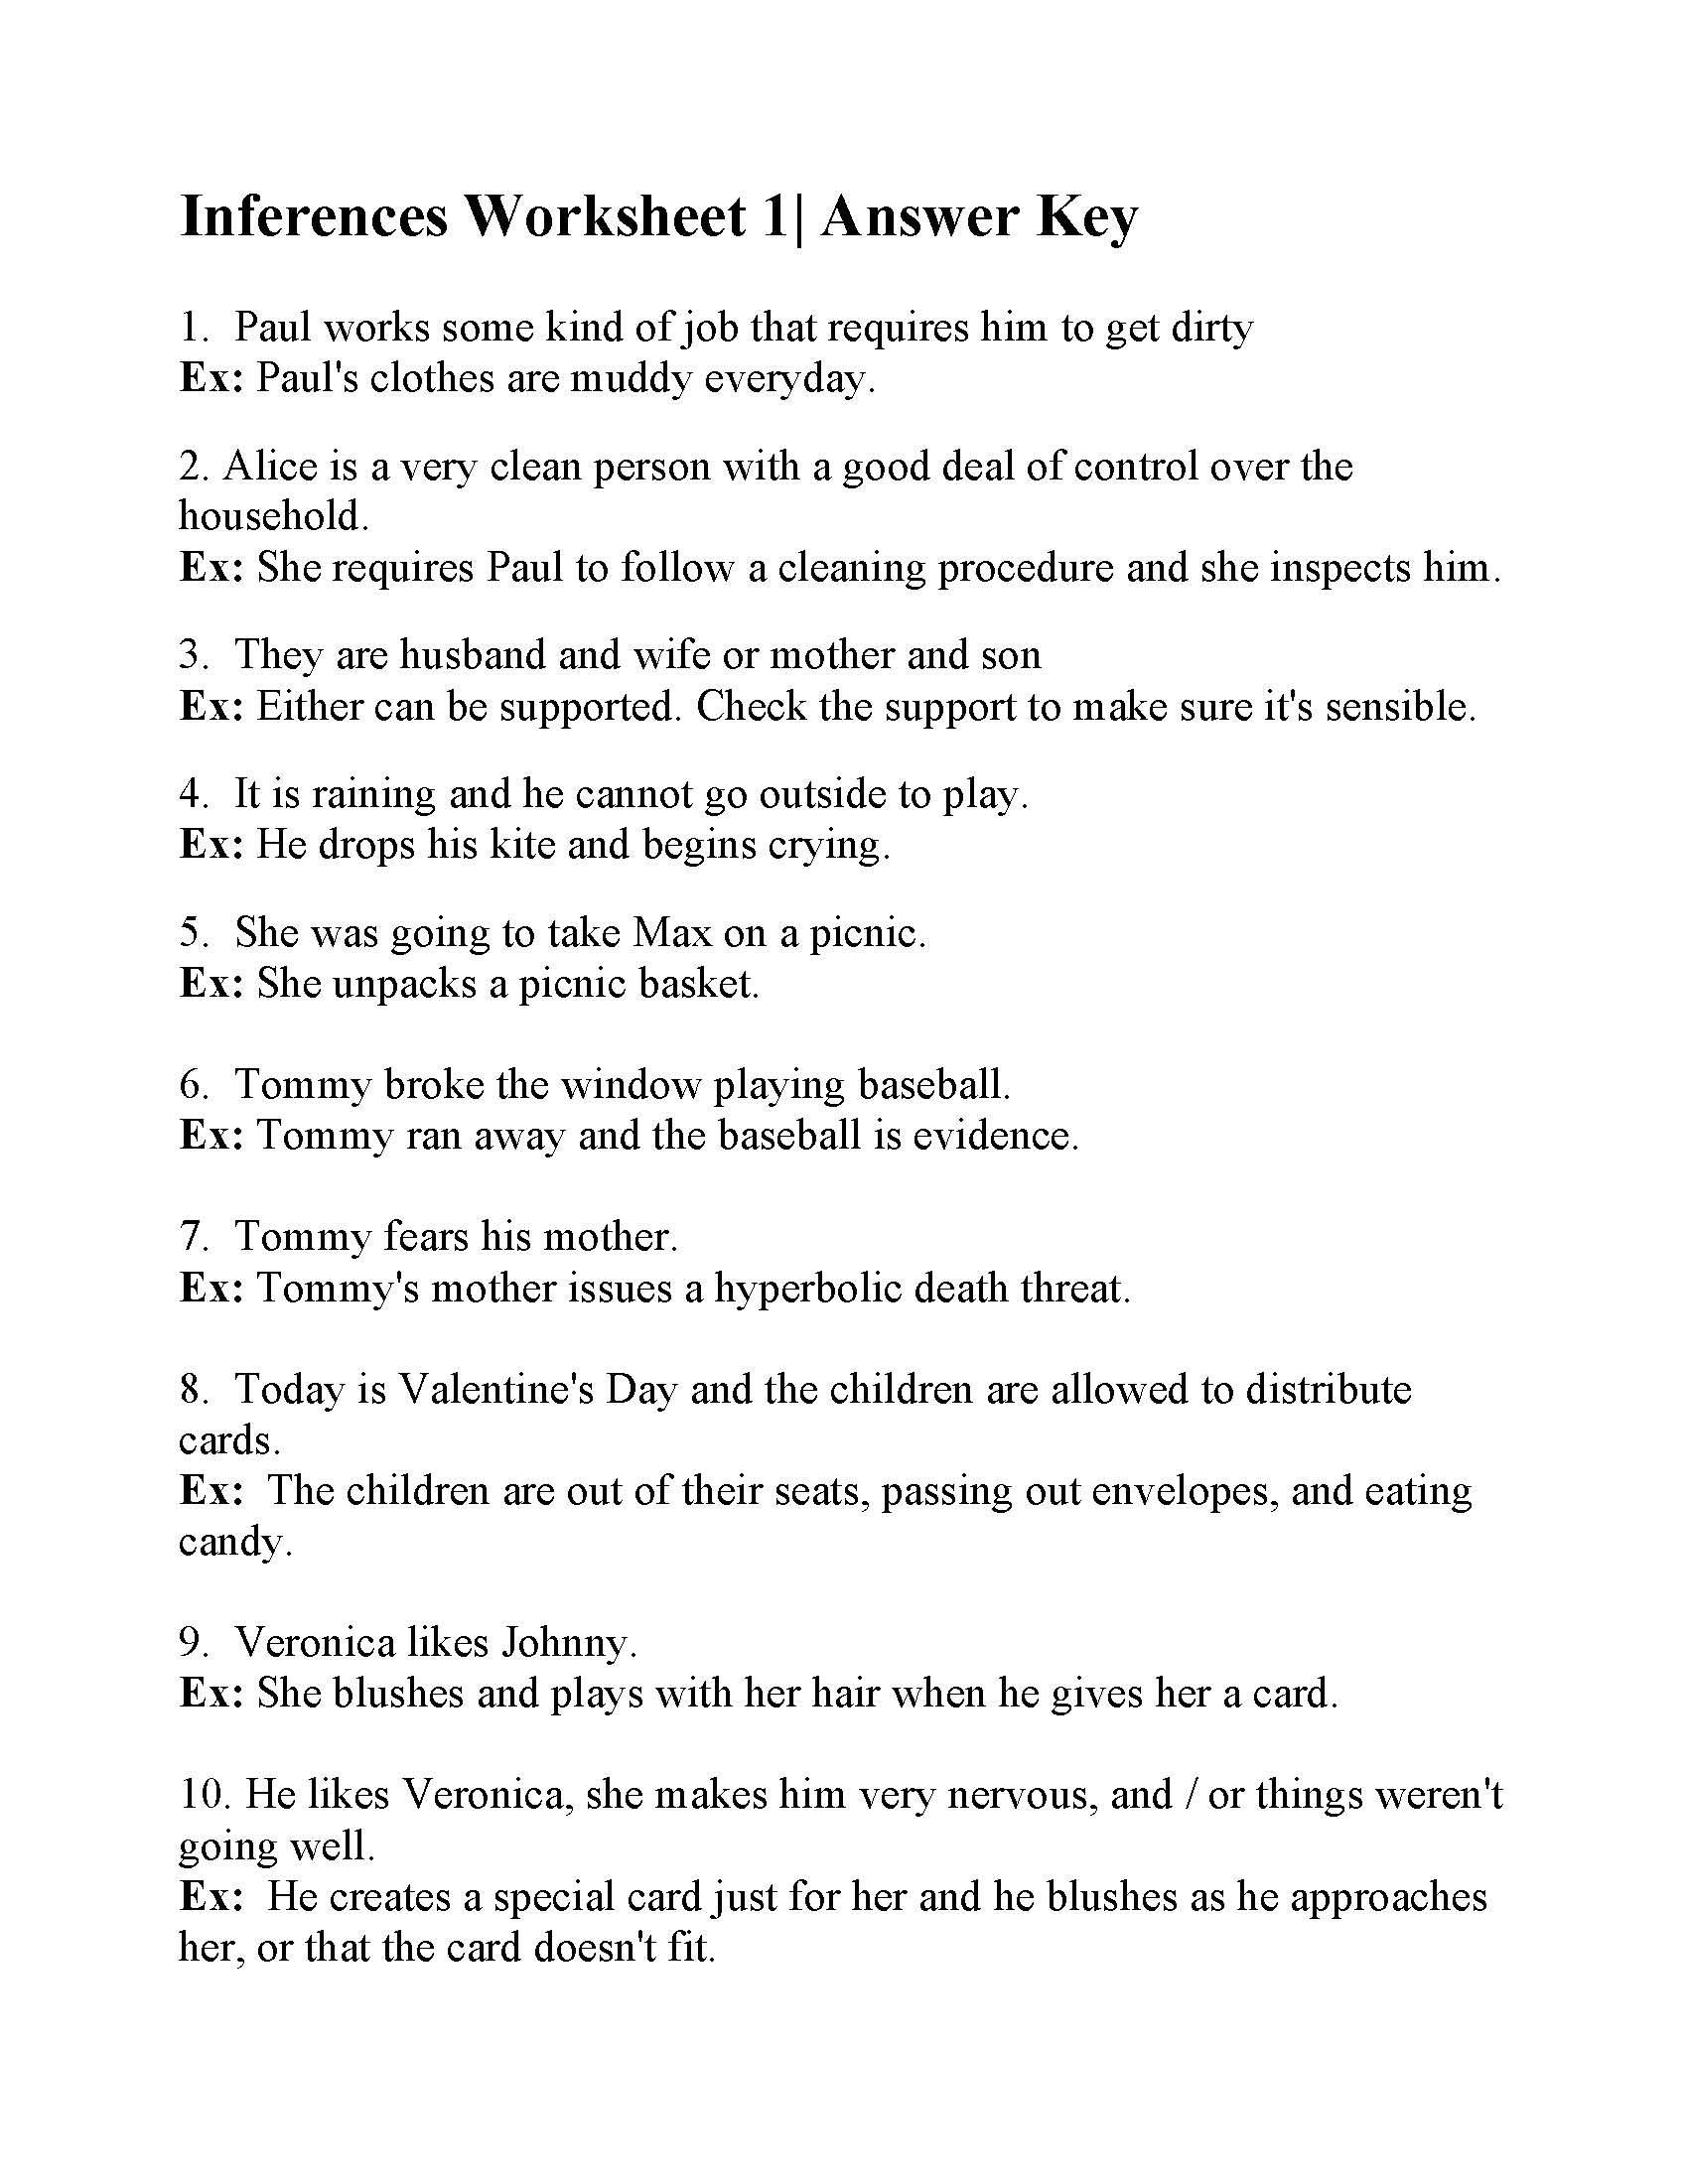 Inferencing Worksheets 4th Grade Inferences Worksheet 1